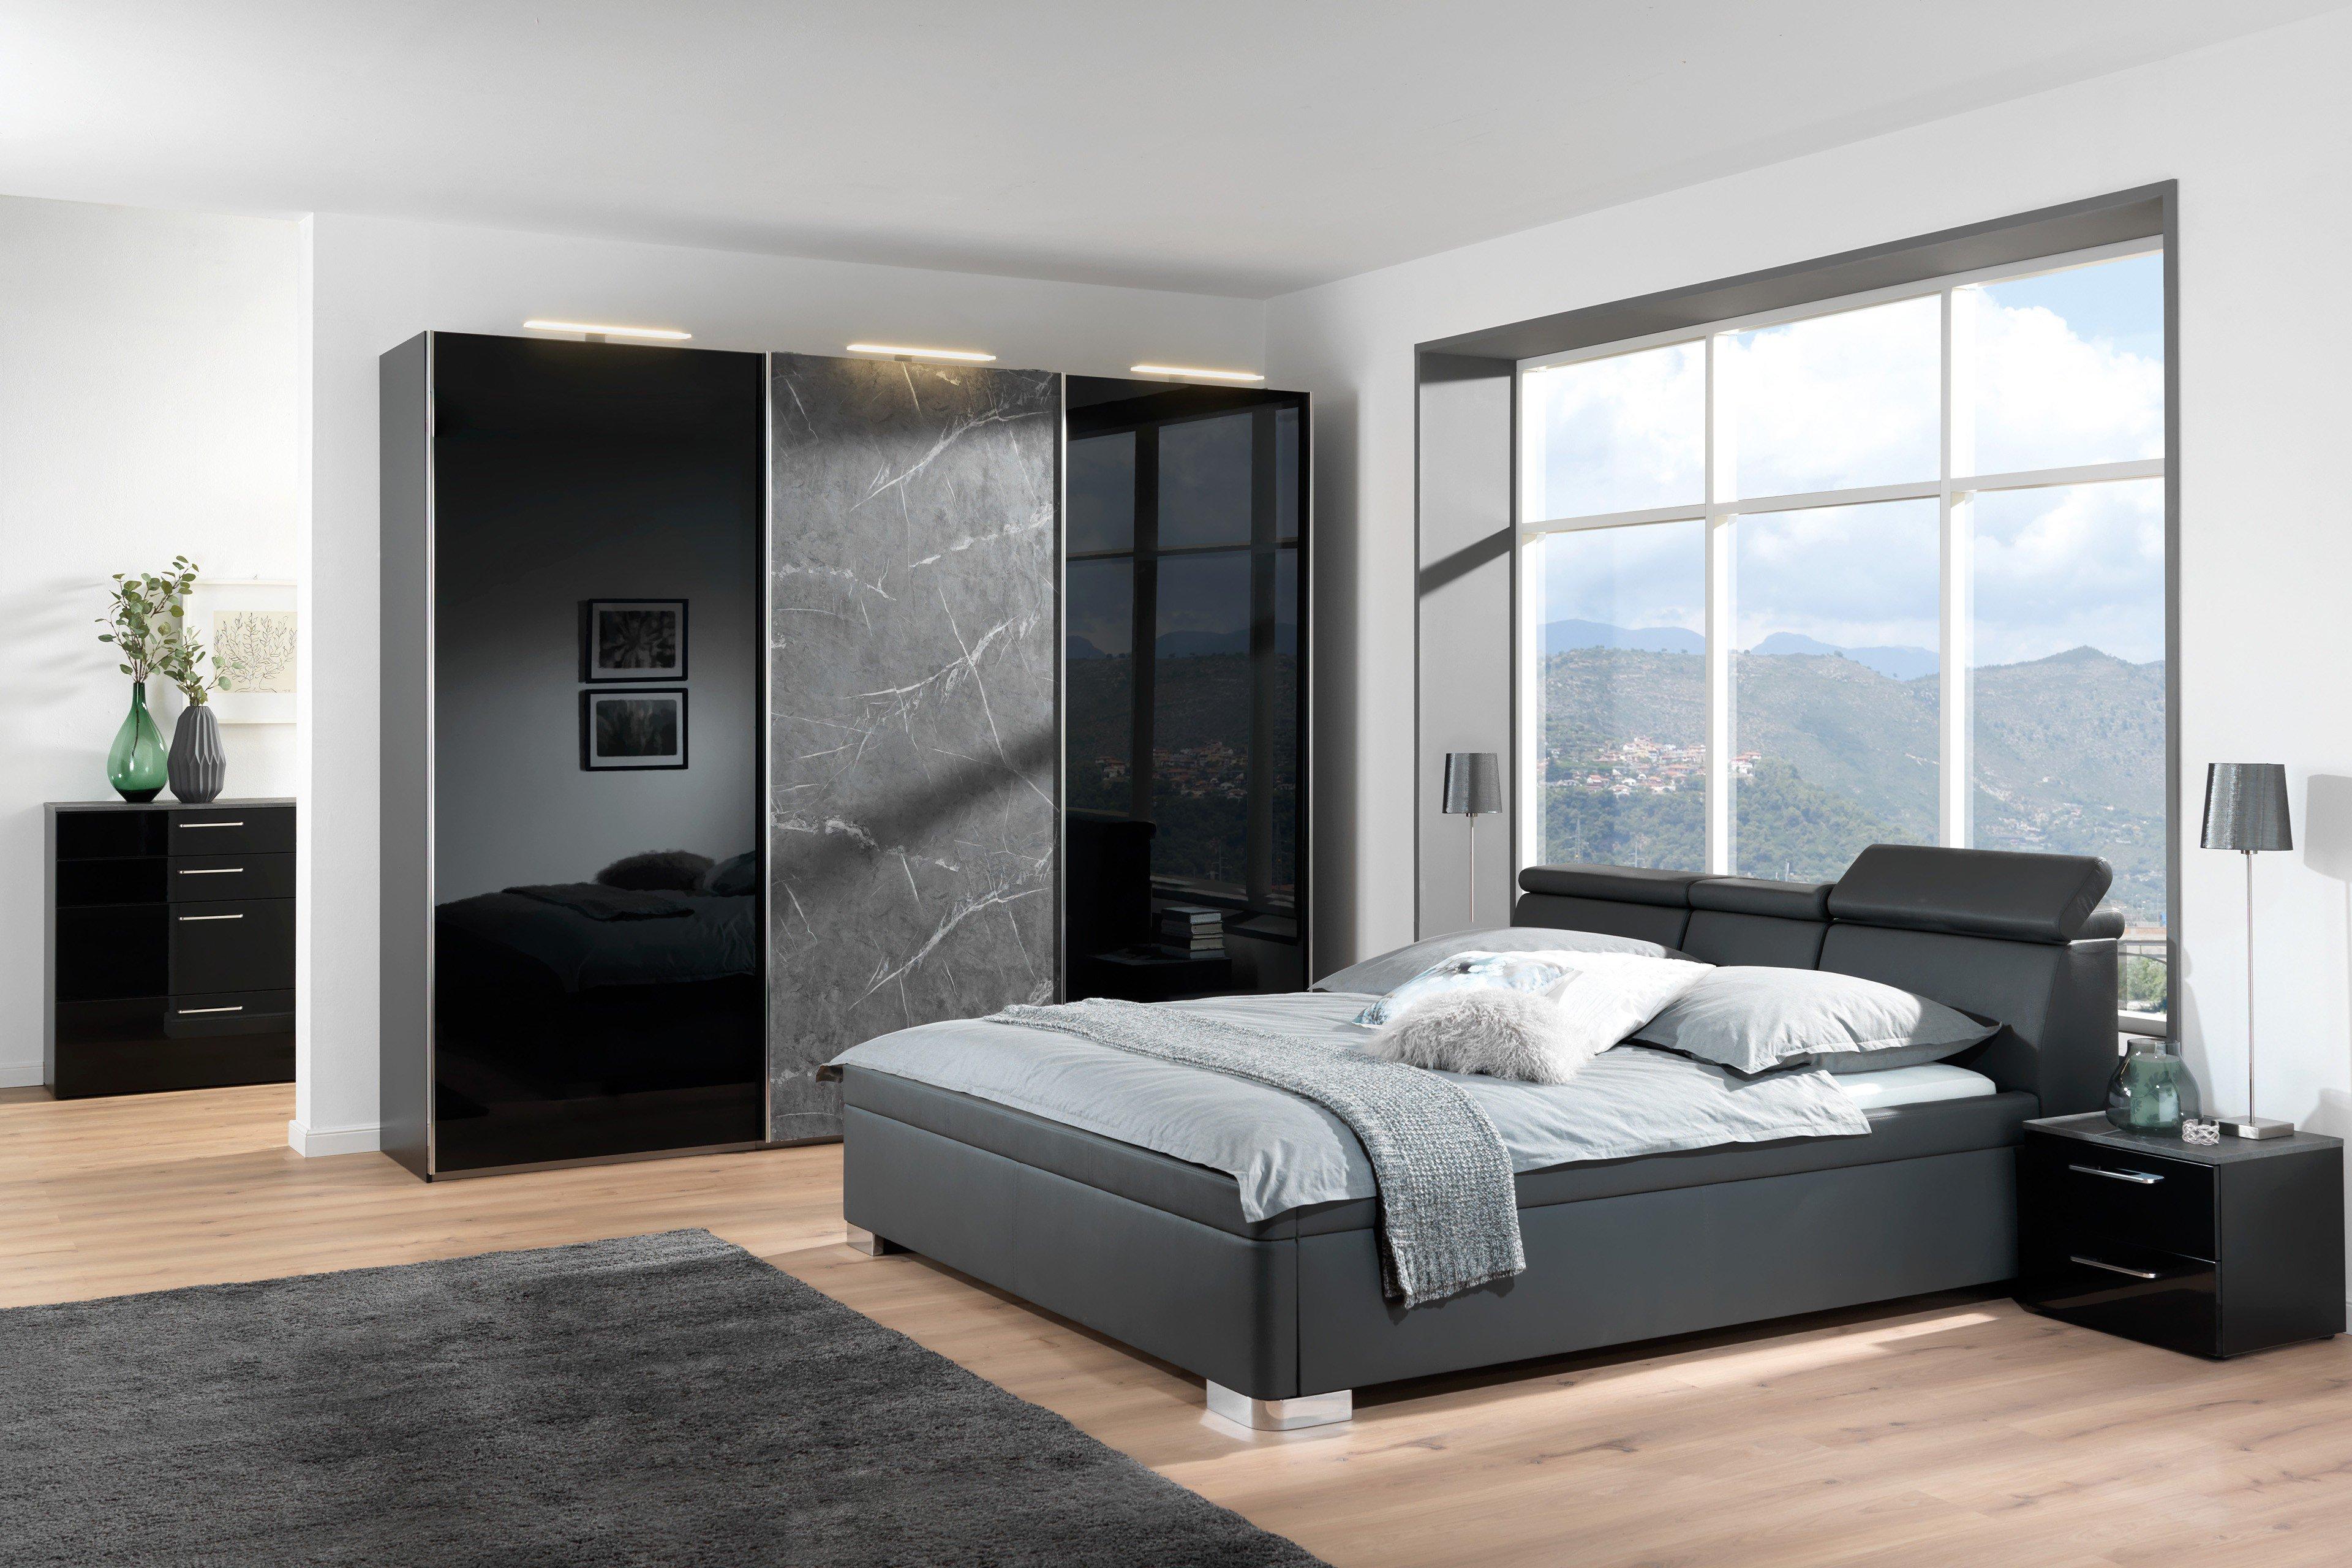 wellem bel nero schrank mood bett schwarz marmor m bel letz ihr online shop. Black Bedroom Furniture Sets. Home Design Ideas